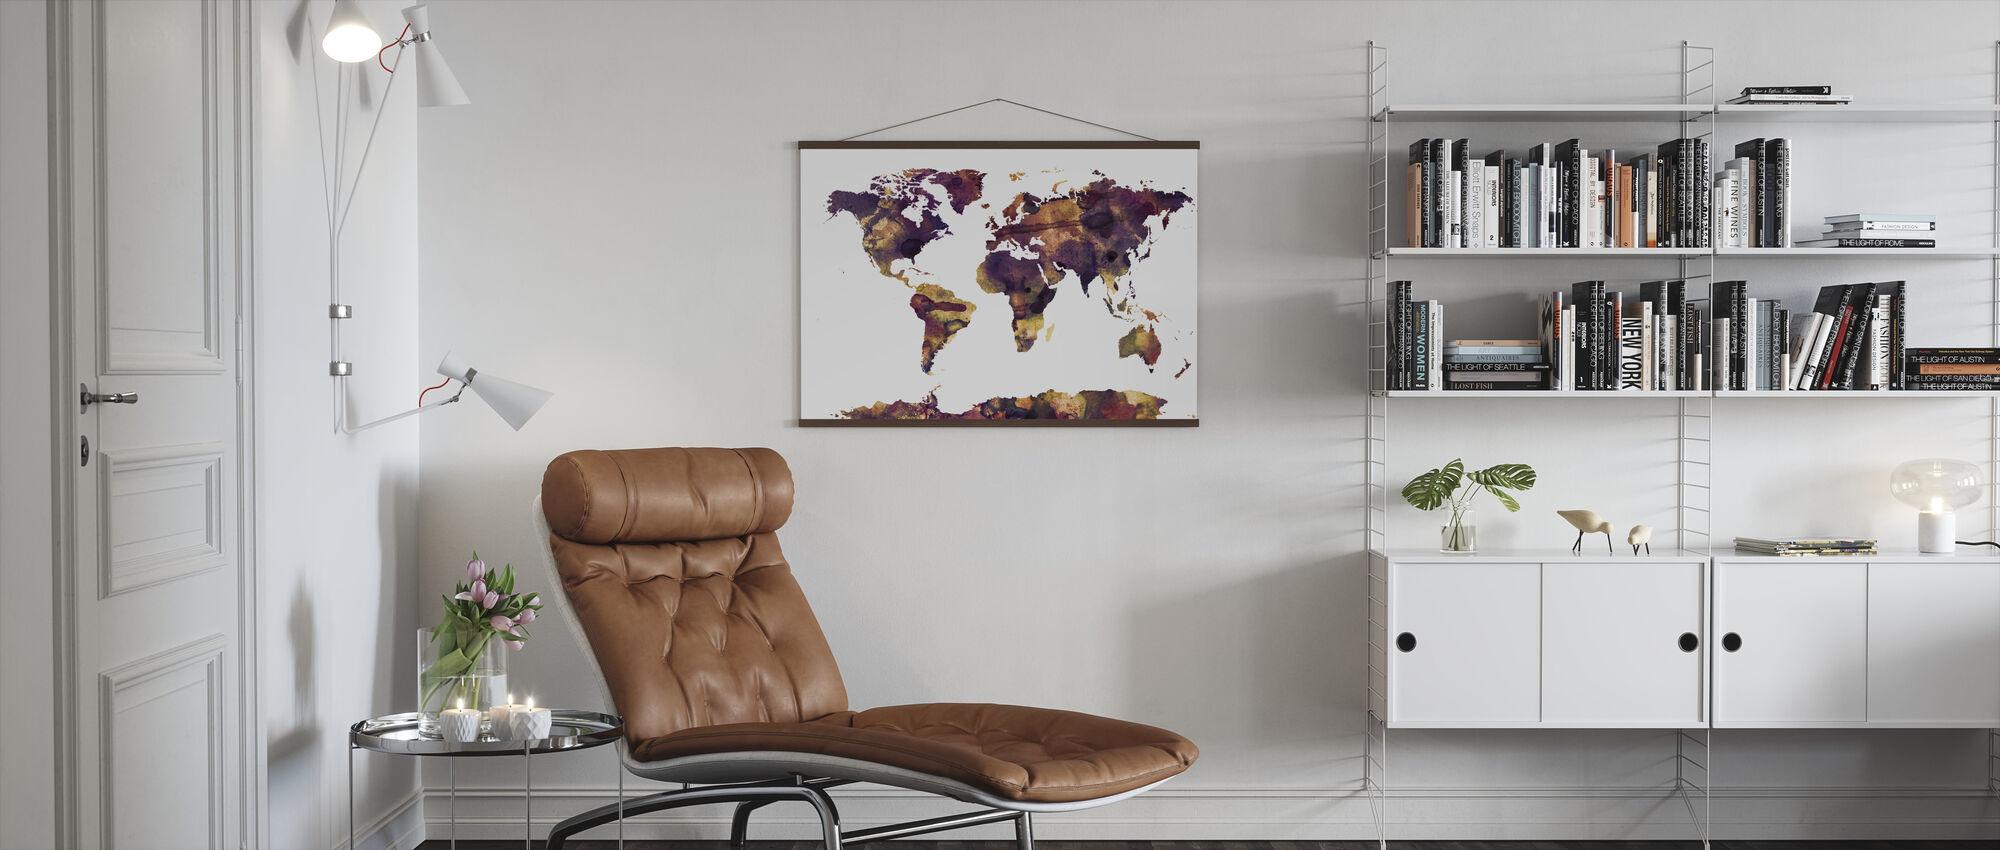 Akvarell World Map Lilla - Plakat - Stue